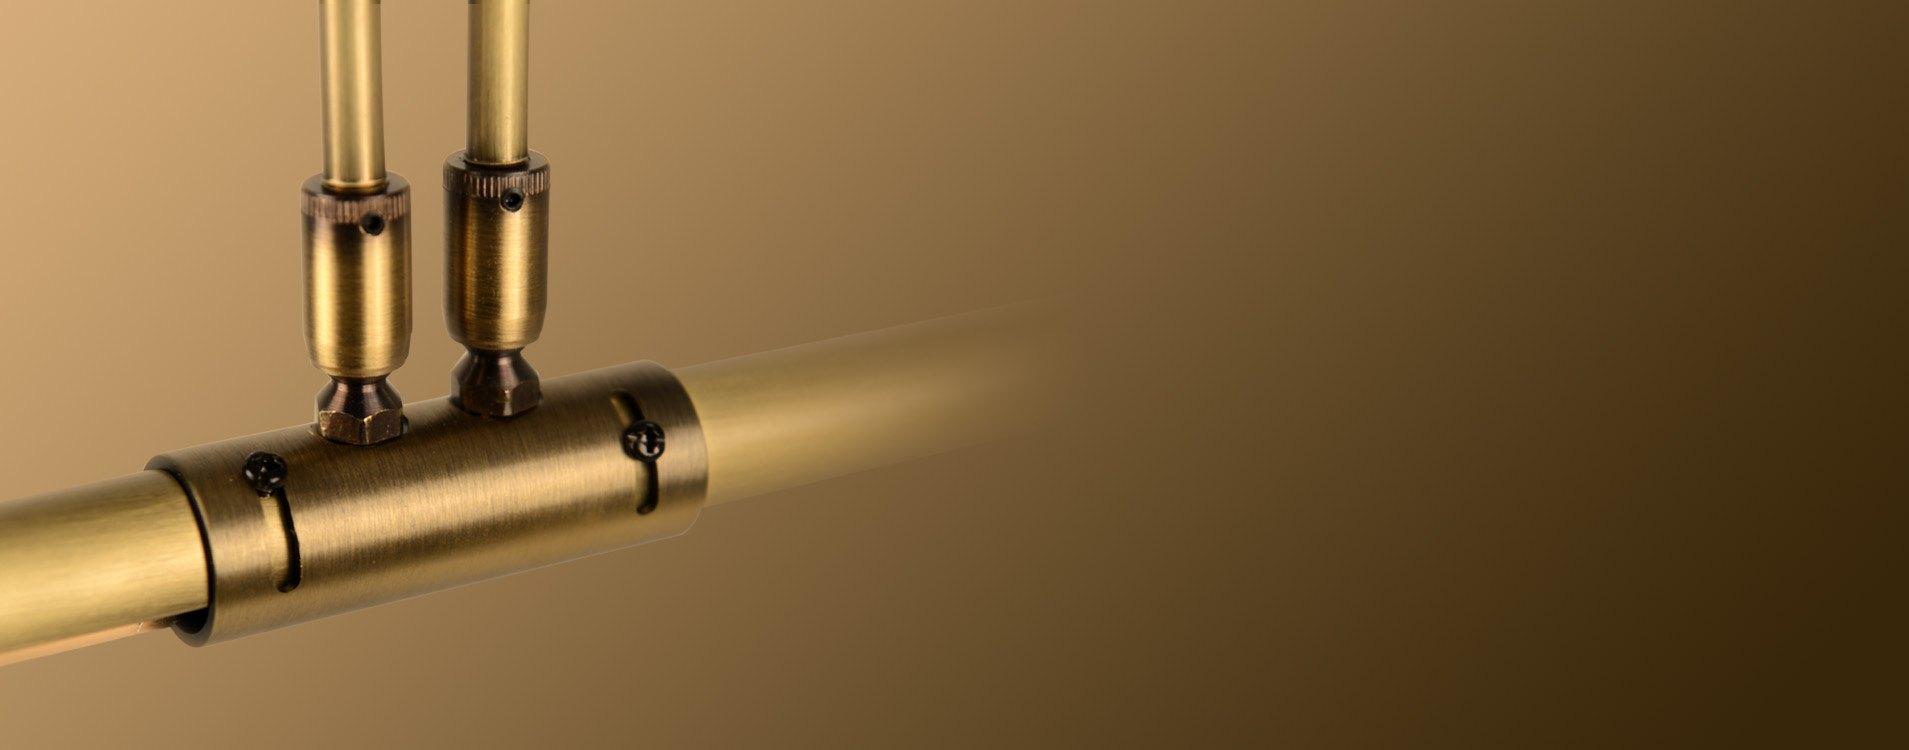 brass grand htm cocoweb p piano lights light antique